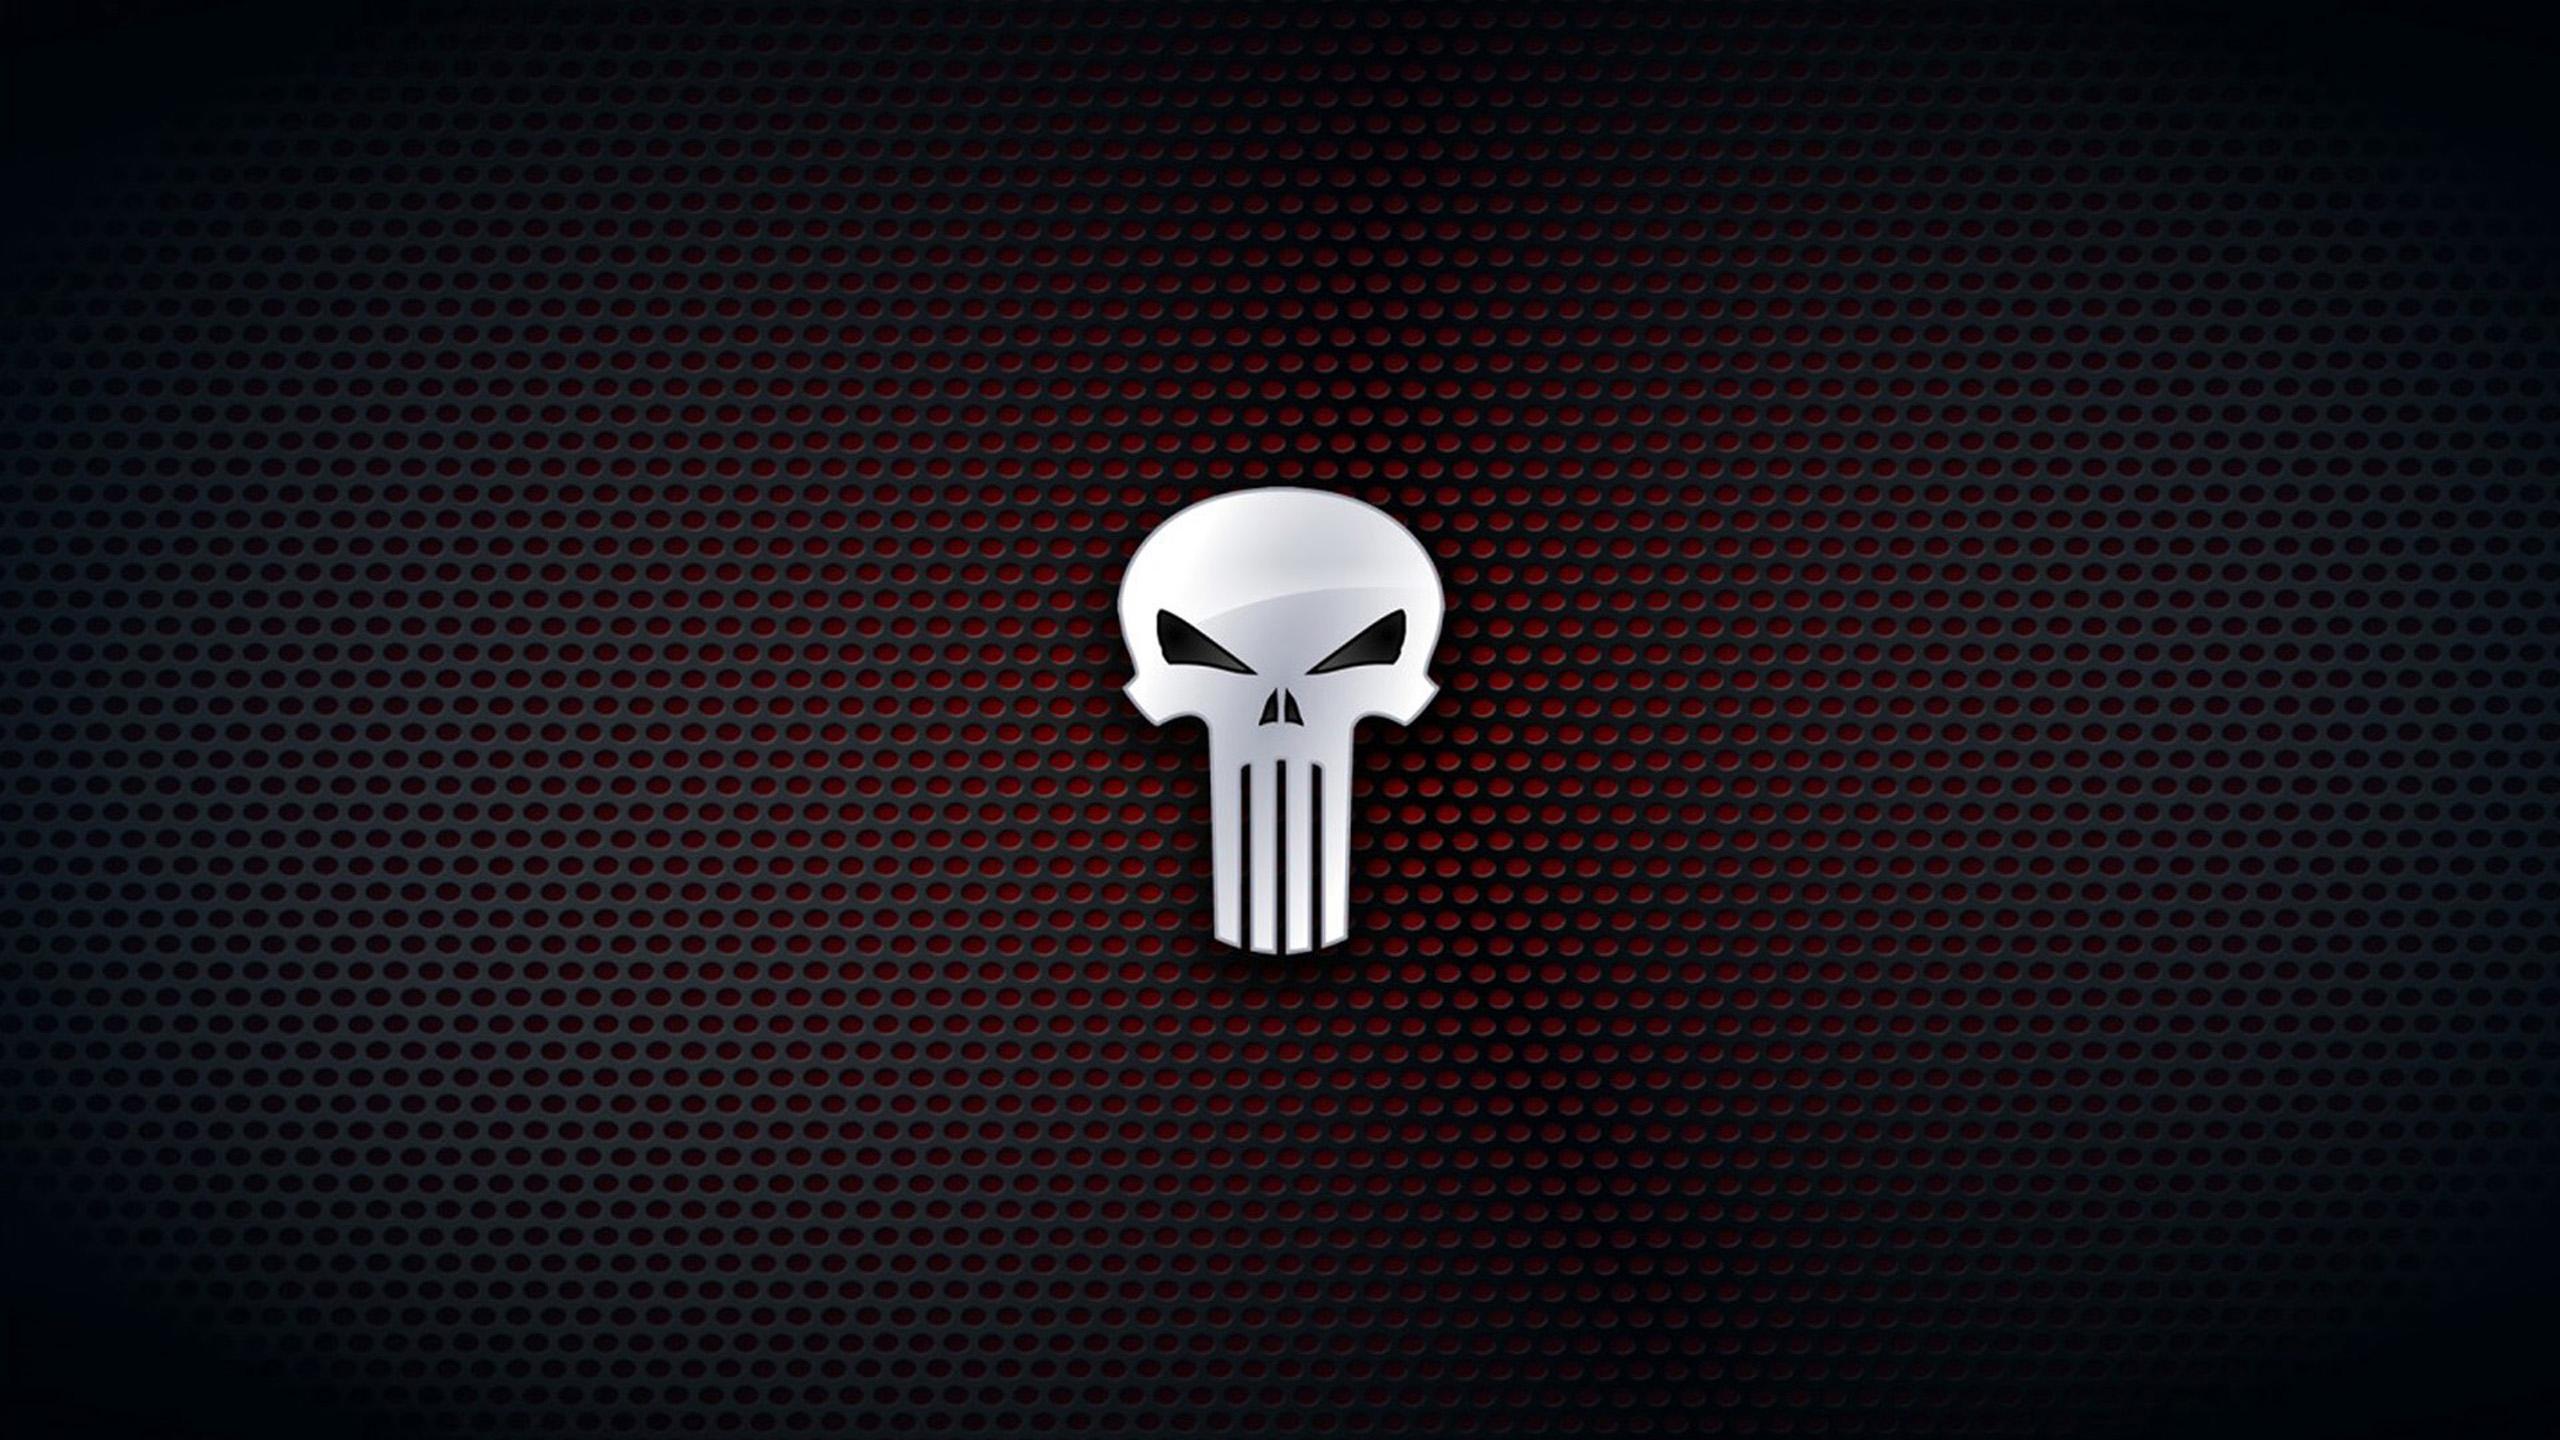 Punisher Wallpaper hd Download Hd(16 9 Wallpaper